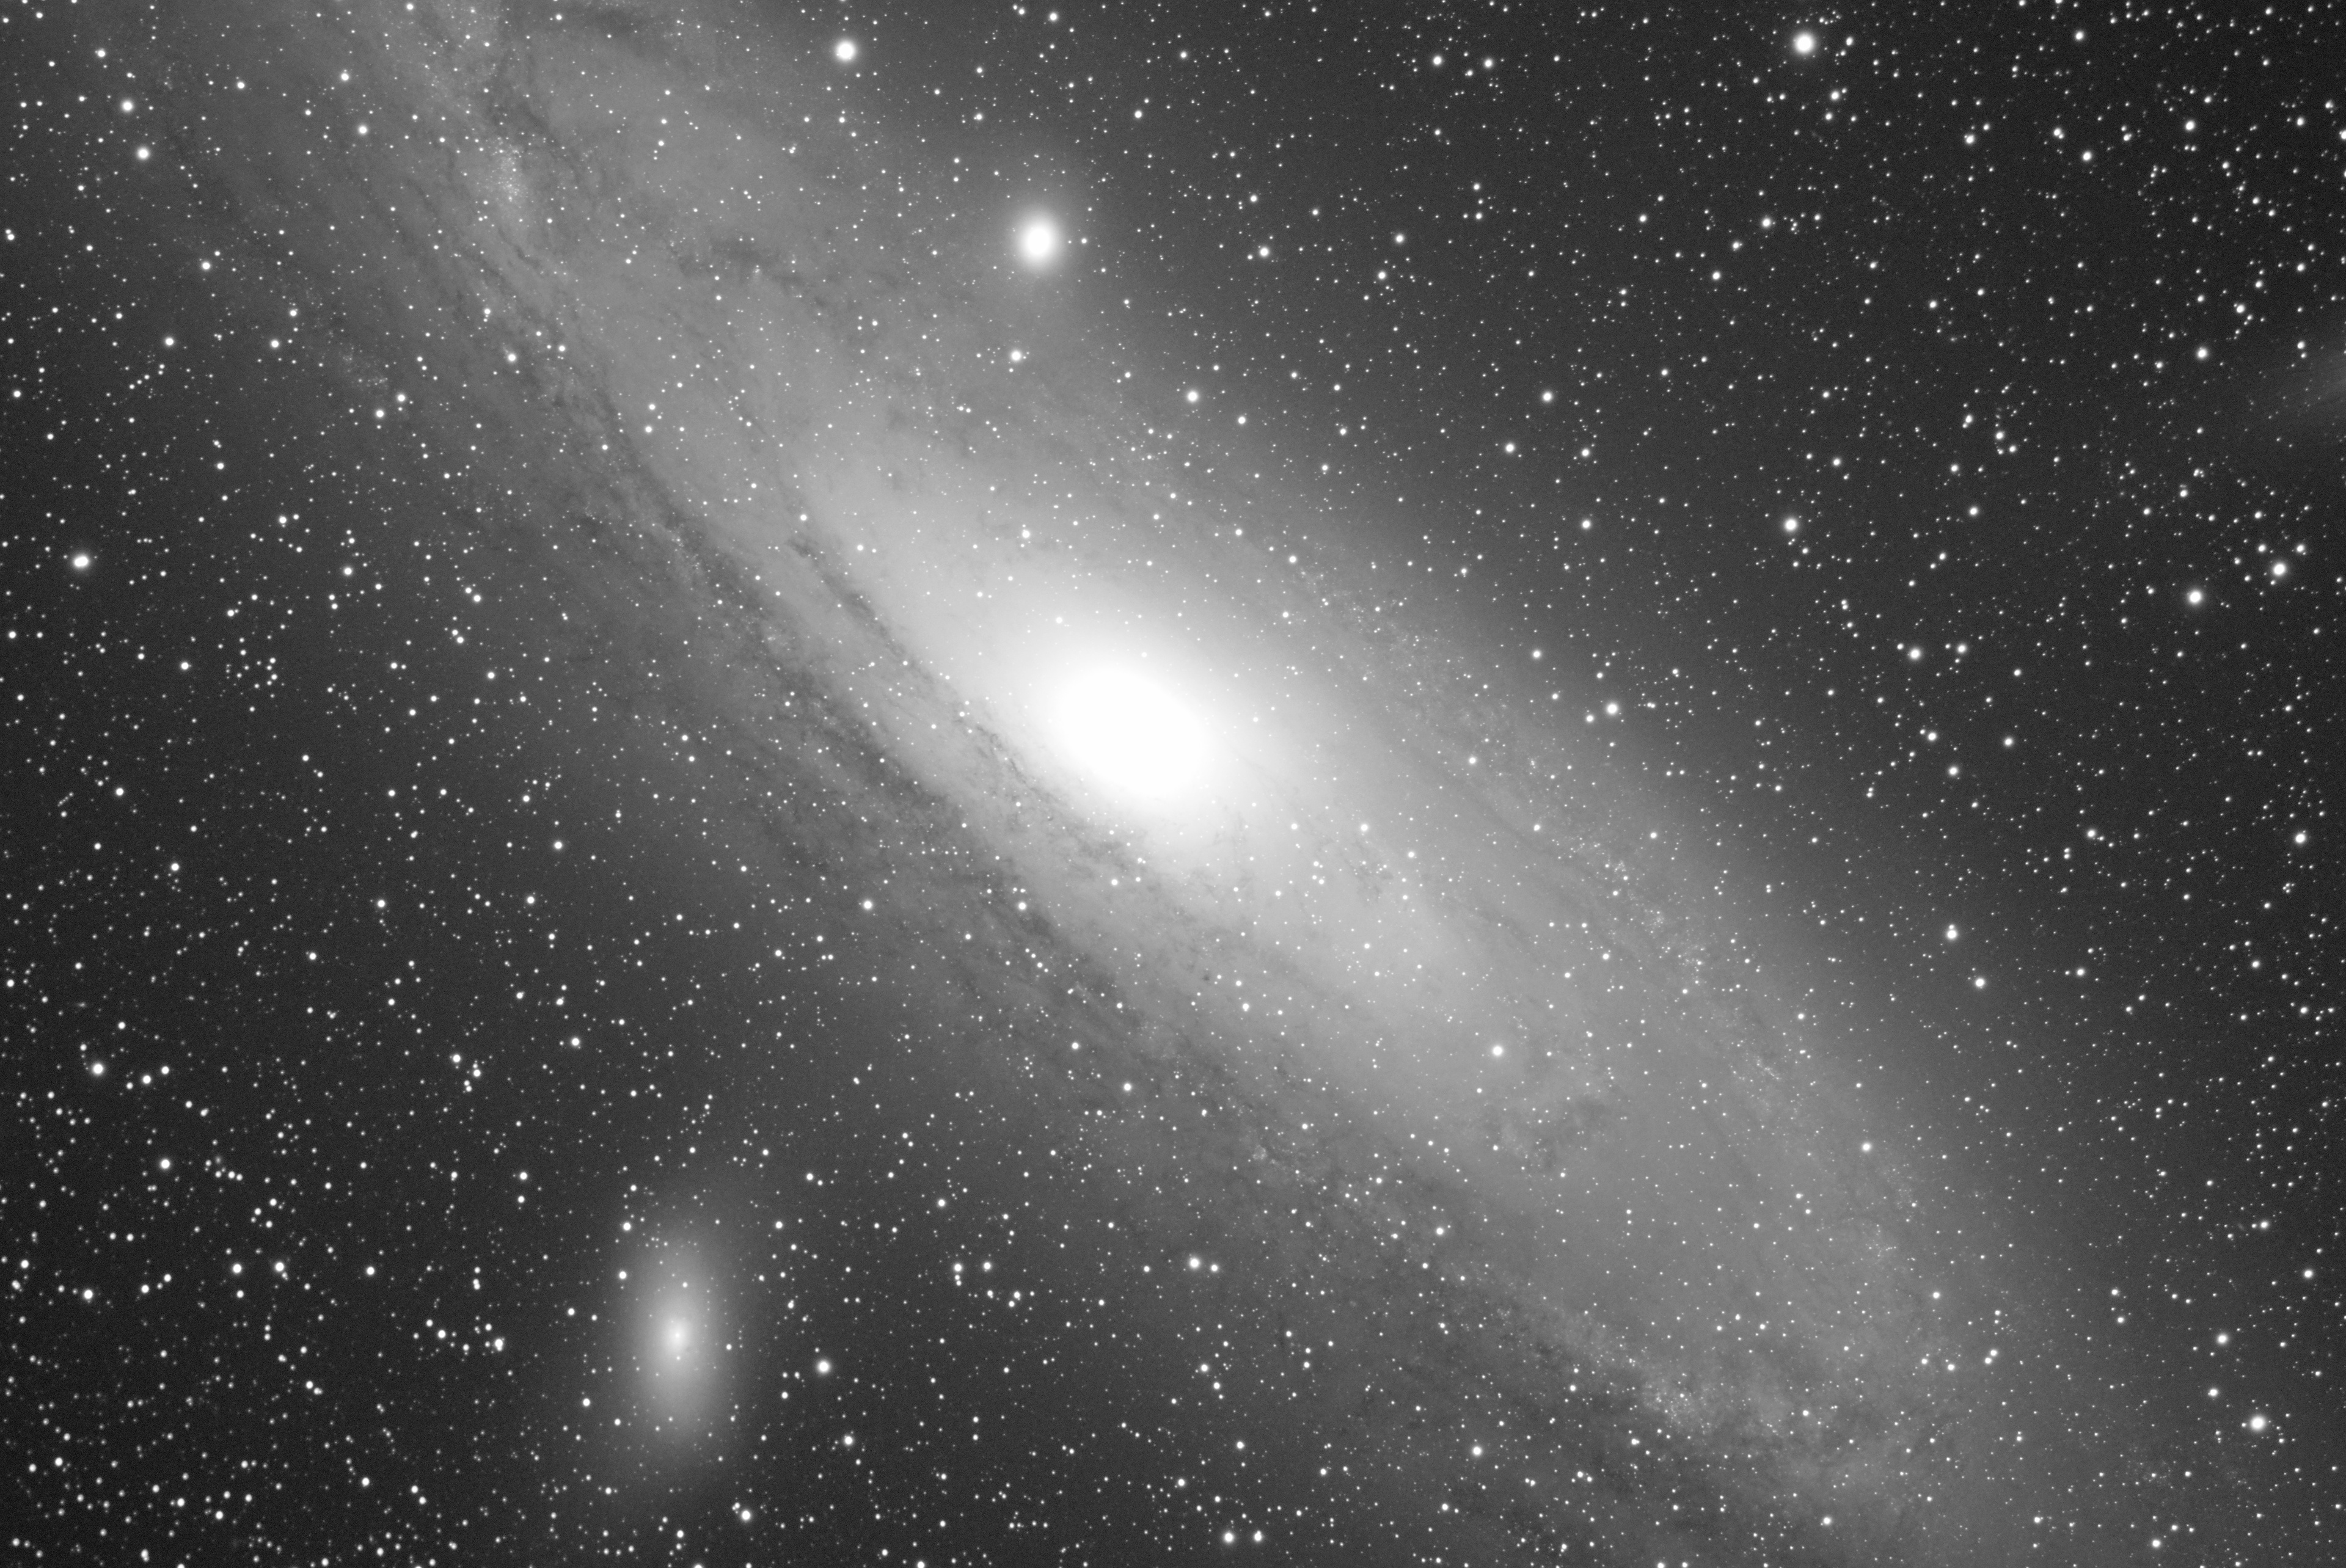 M31_10x90s_gain25.jpg